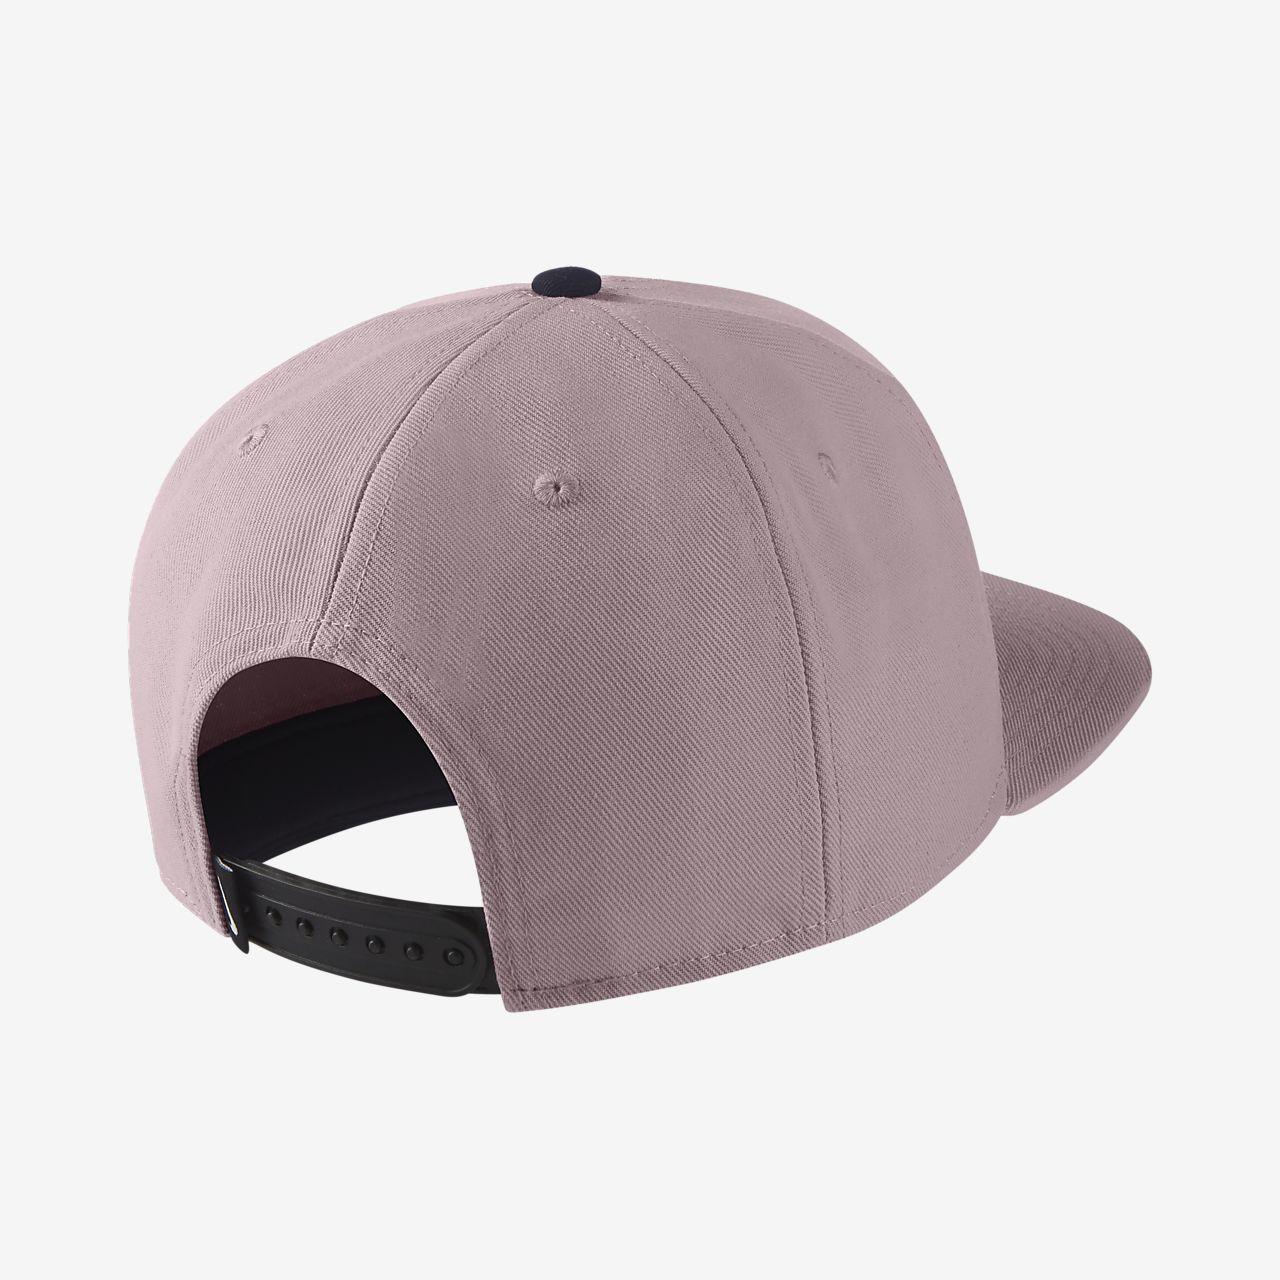 409cb42a9b787 Low Resolution Nike Sportswear Pro Adjustable Hat Nike Sportswear Pro  Adjustable Hat